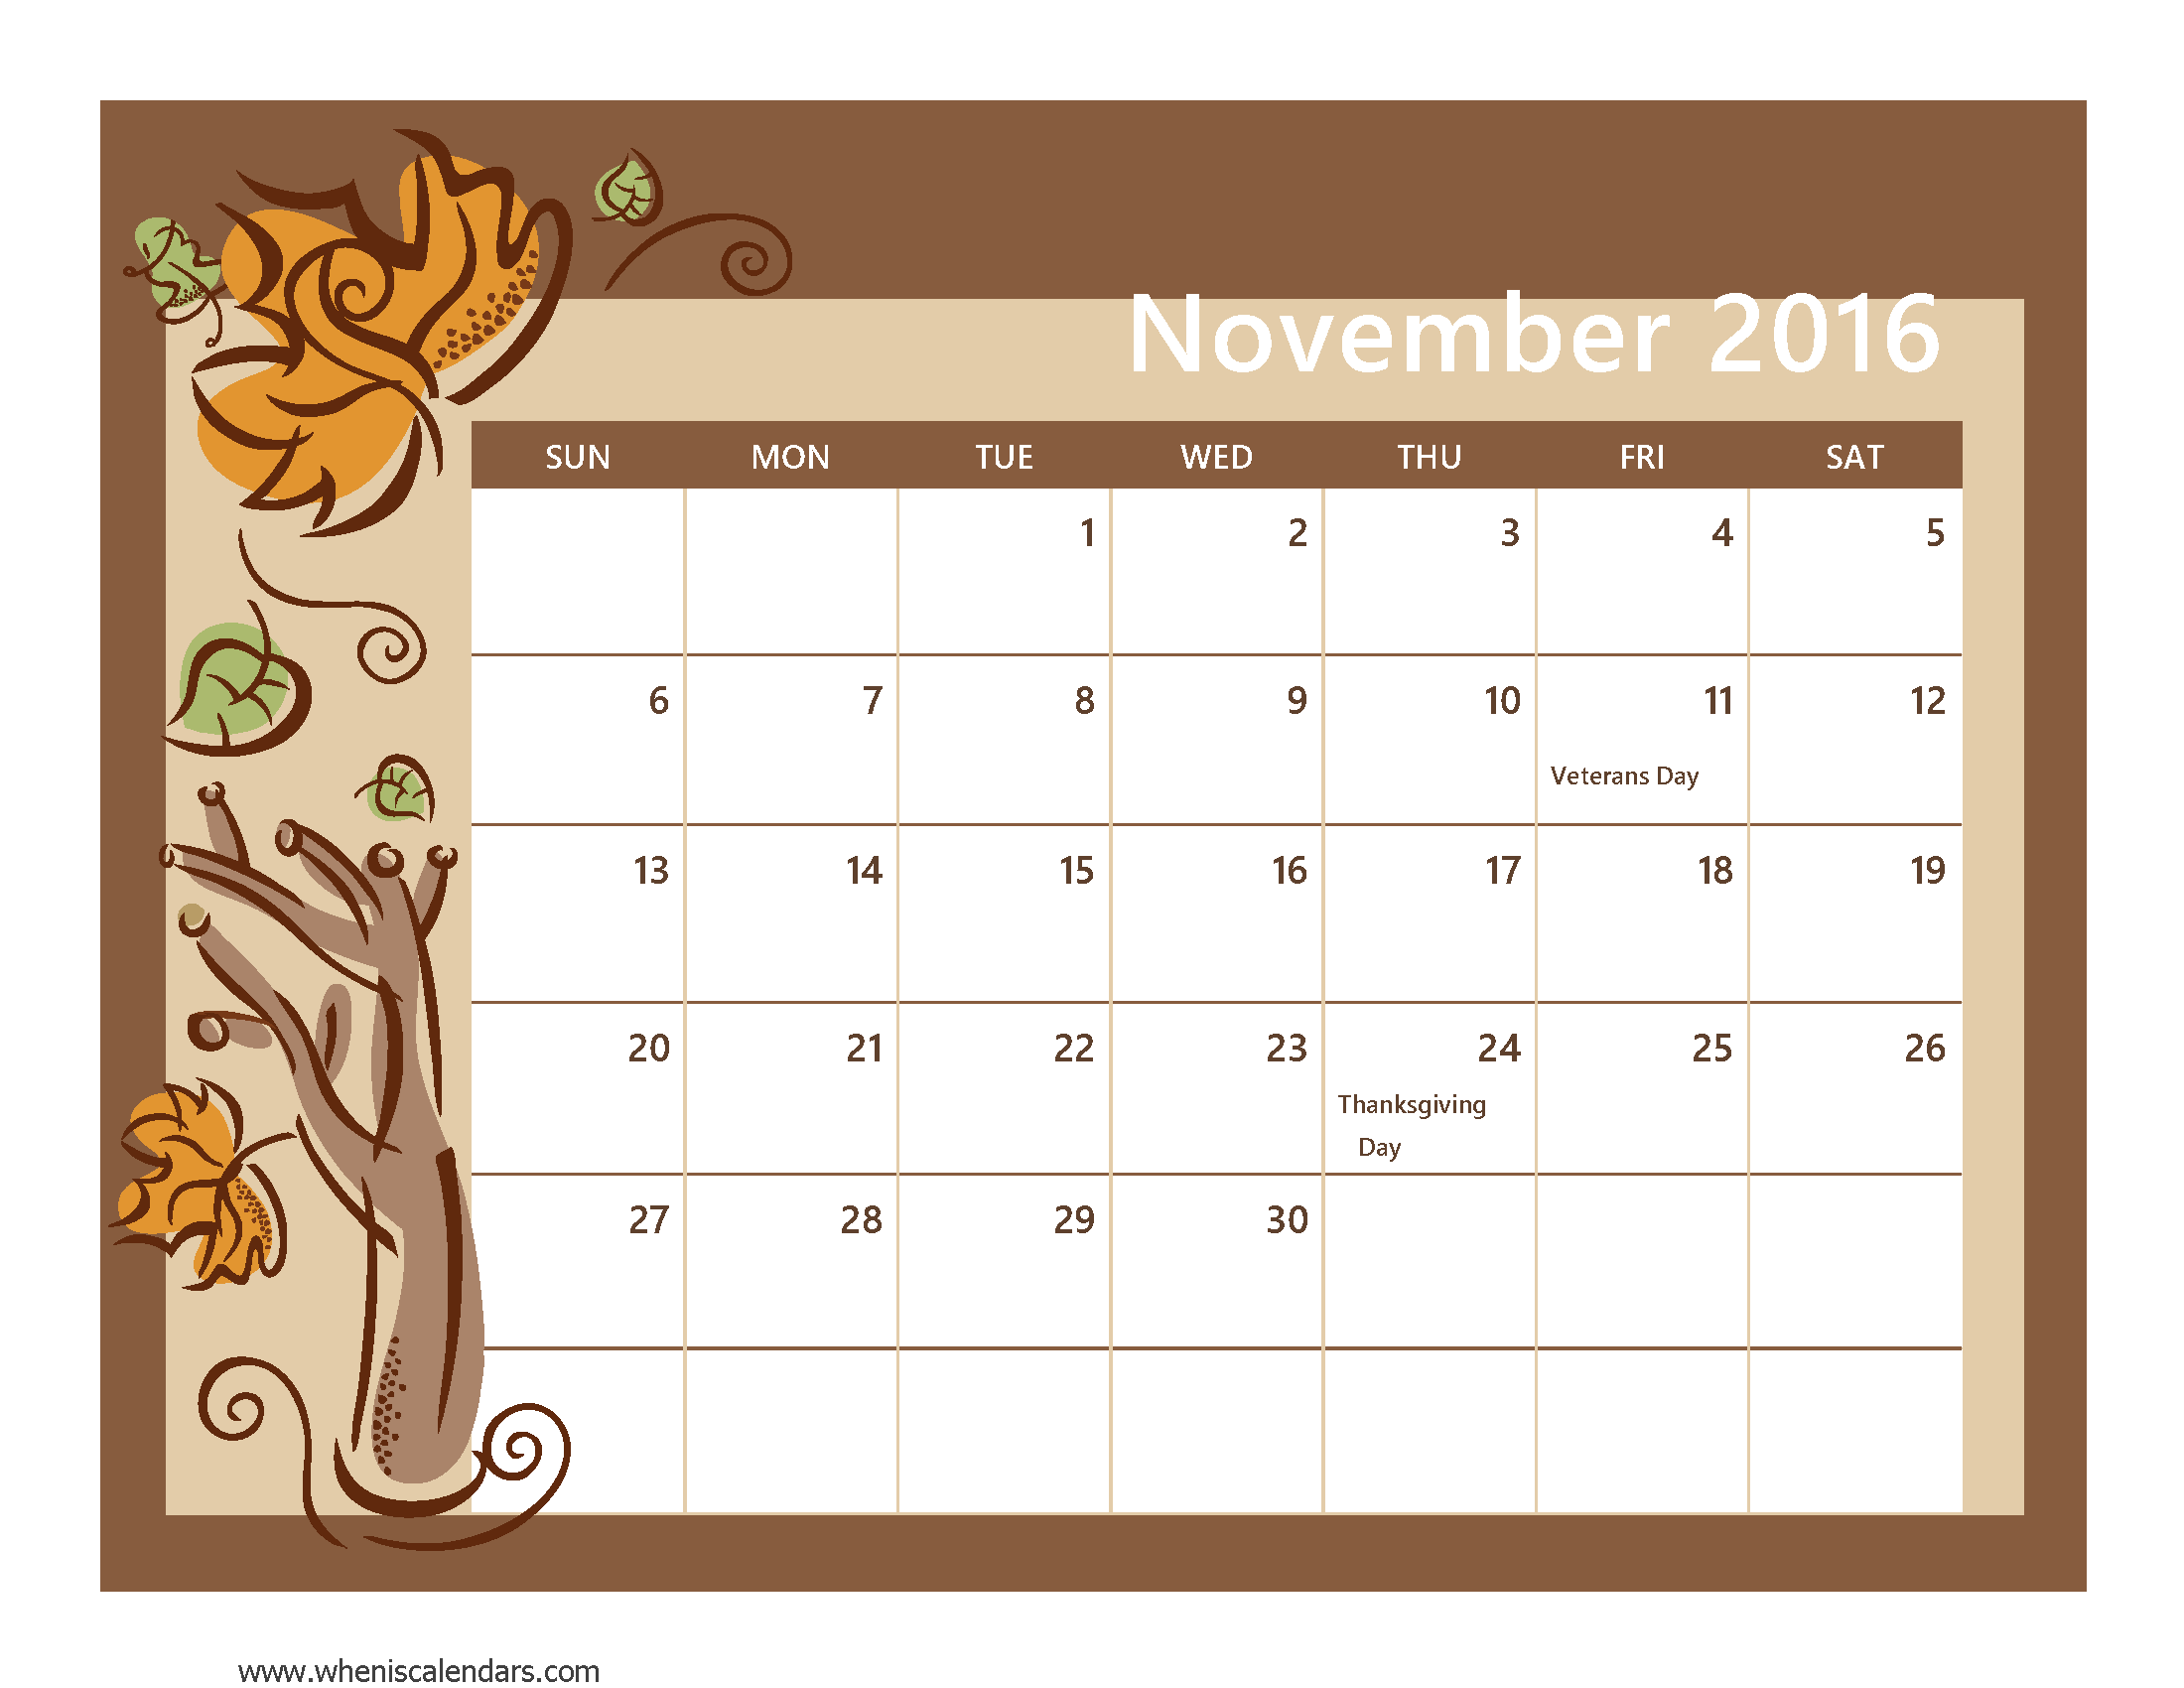 Calendar Clipart November 2016.